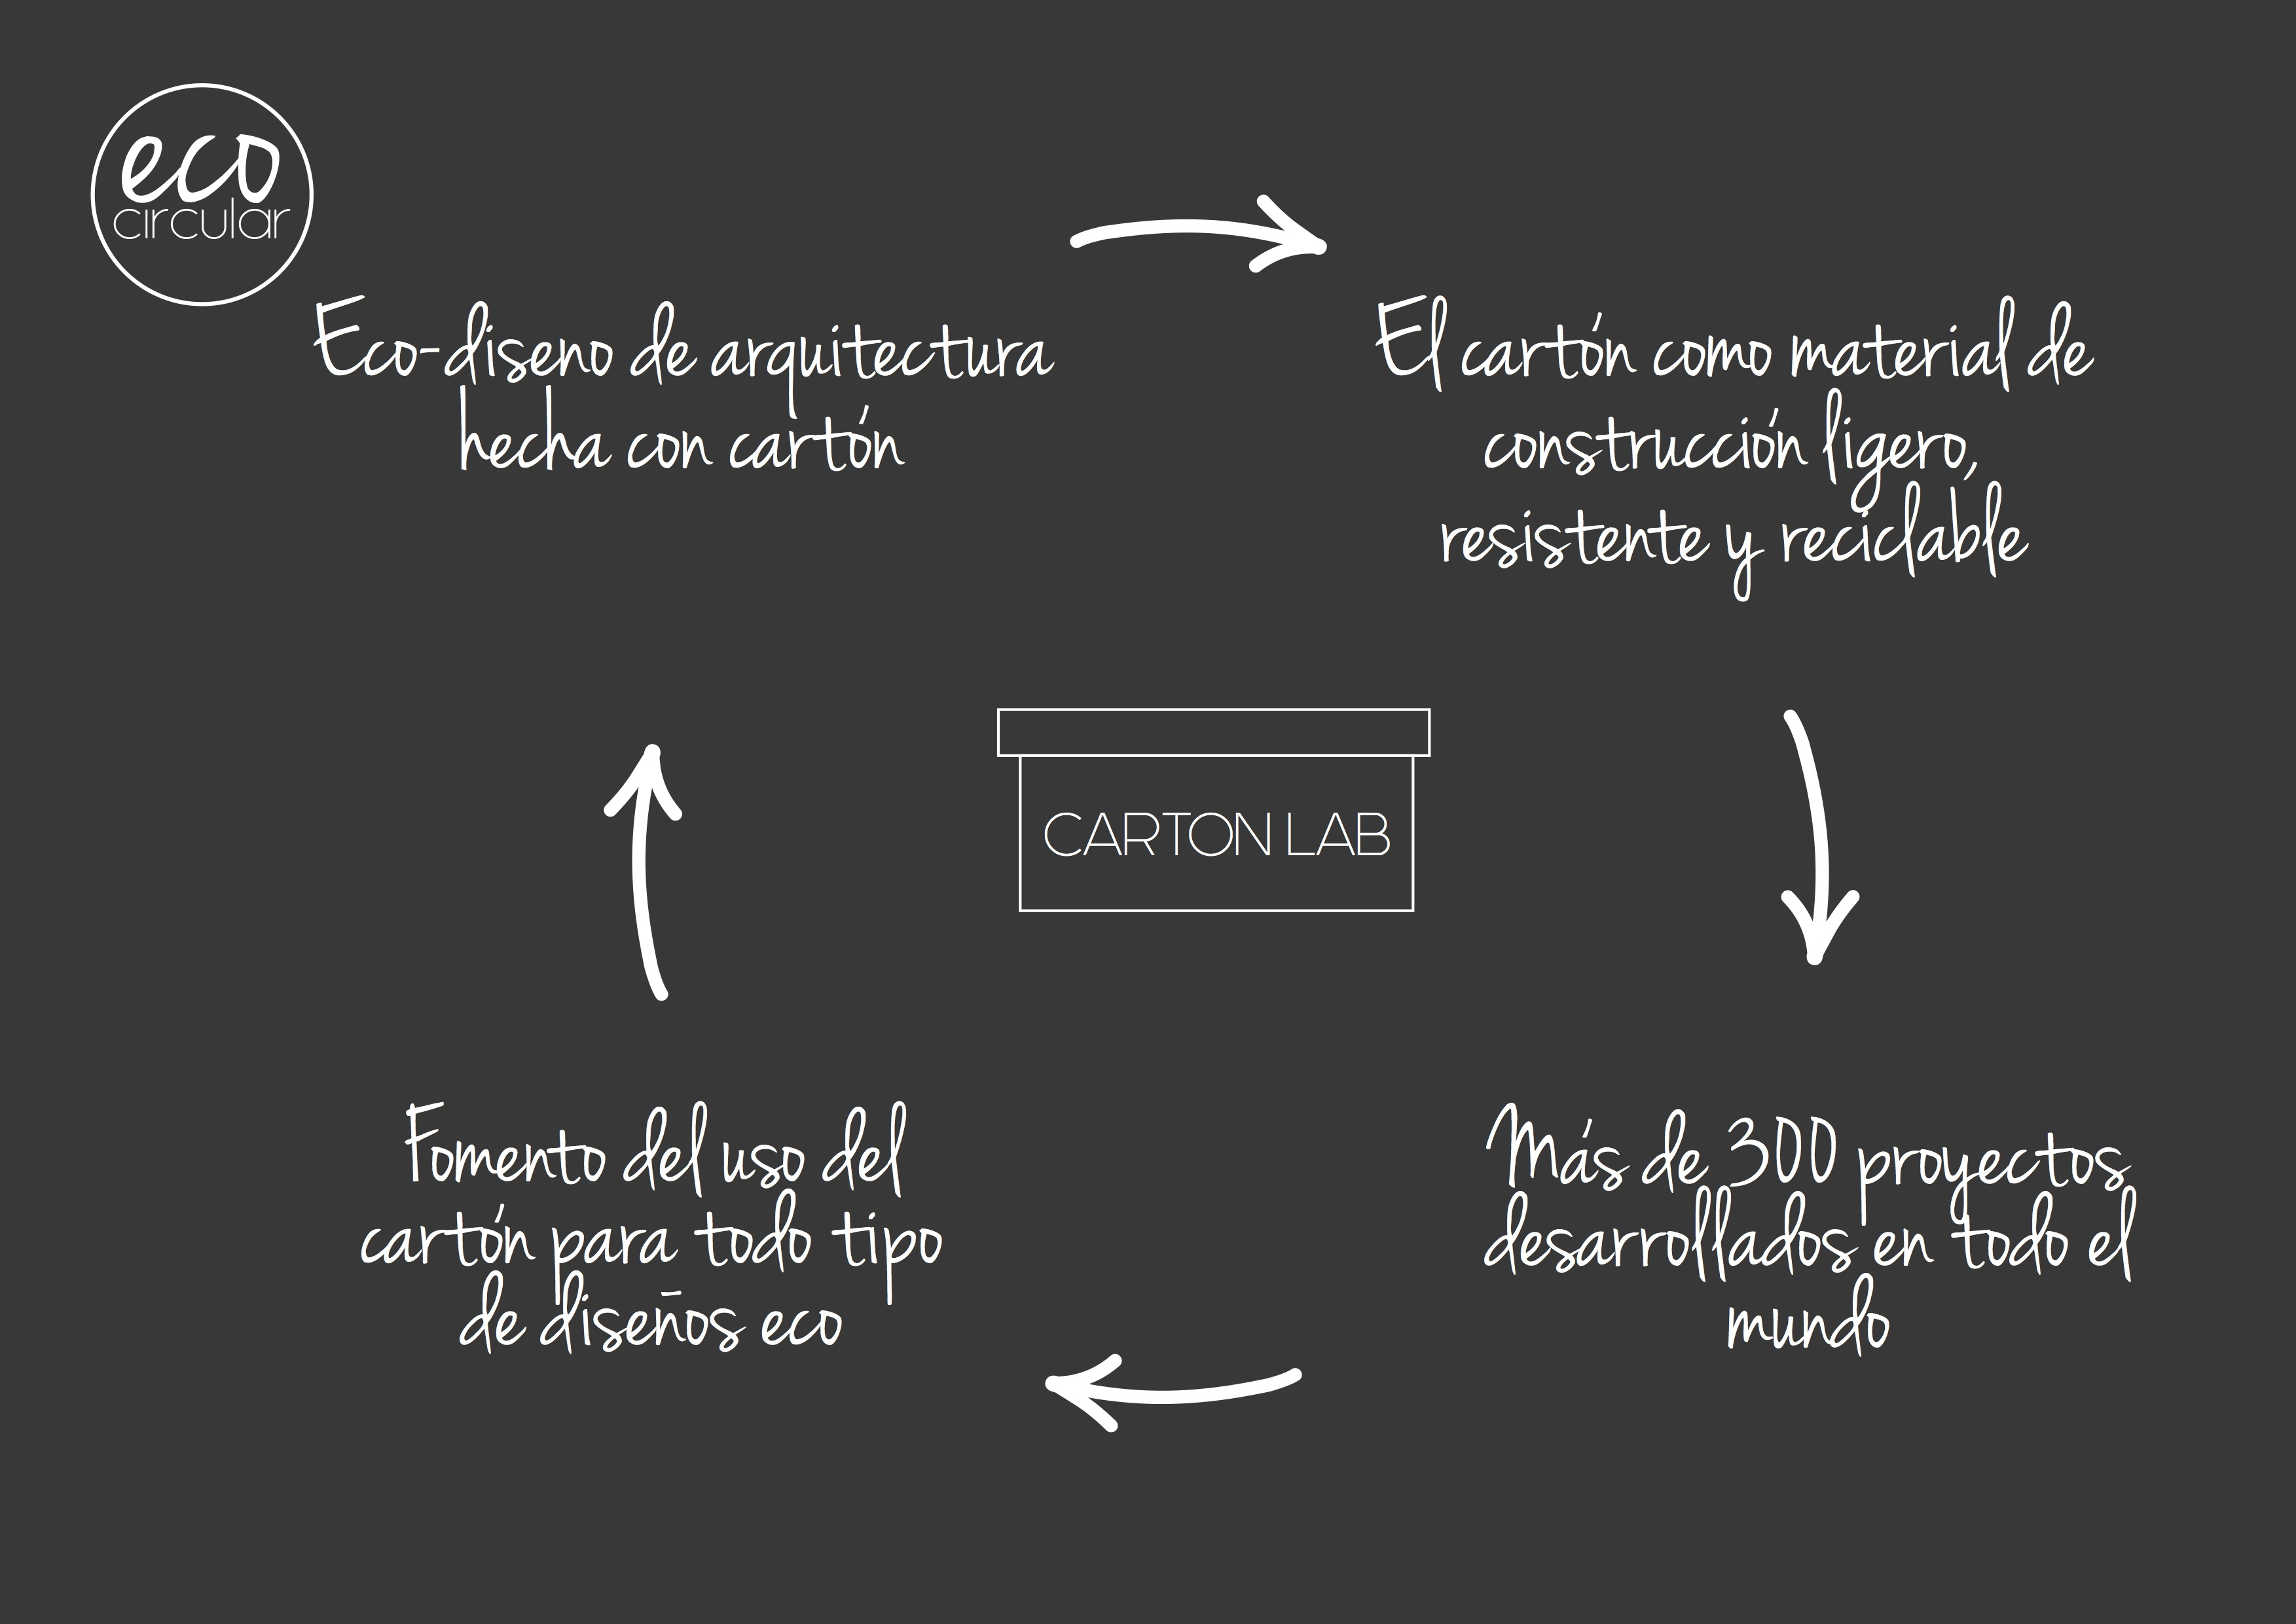 cartonlab